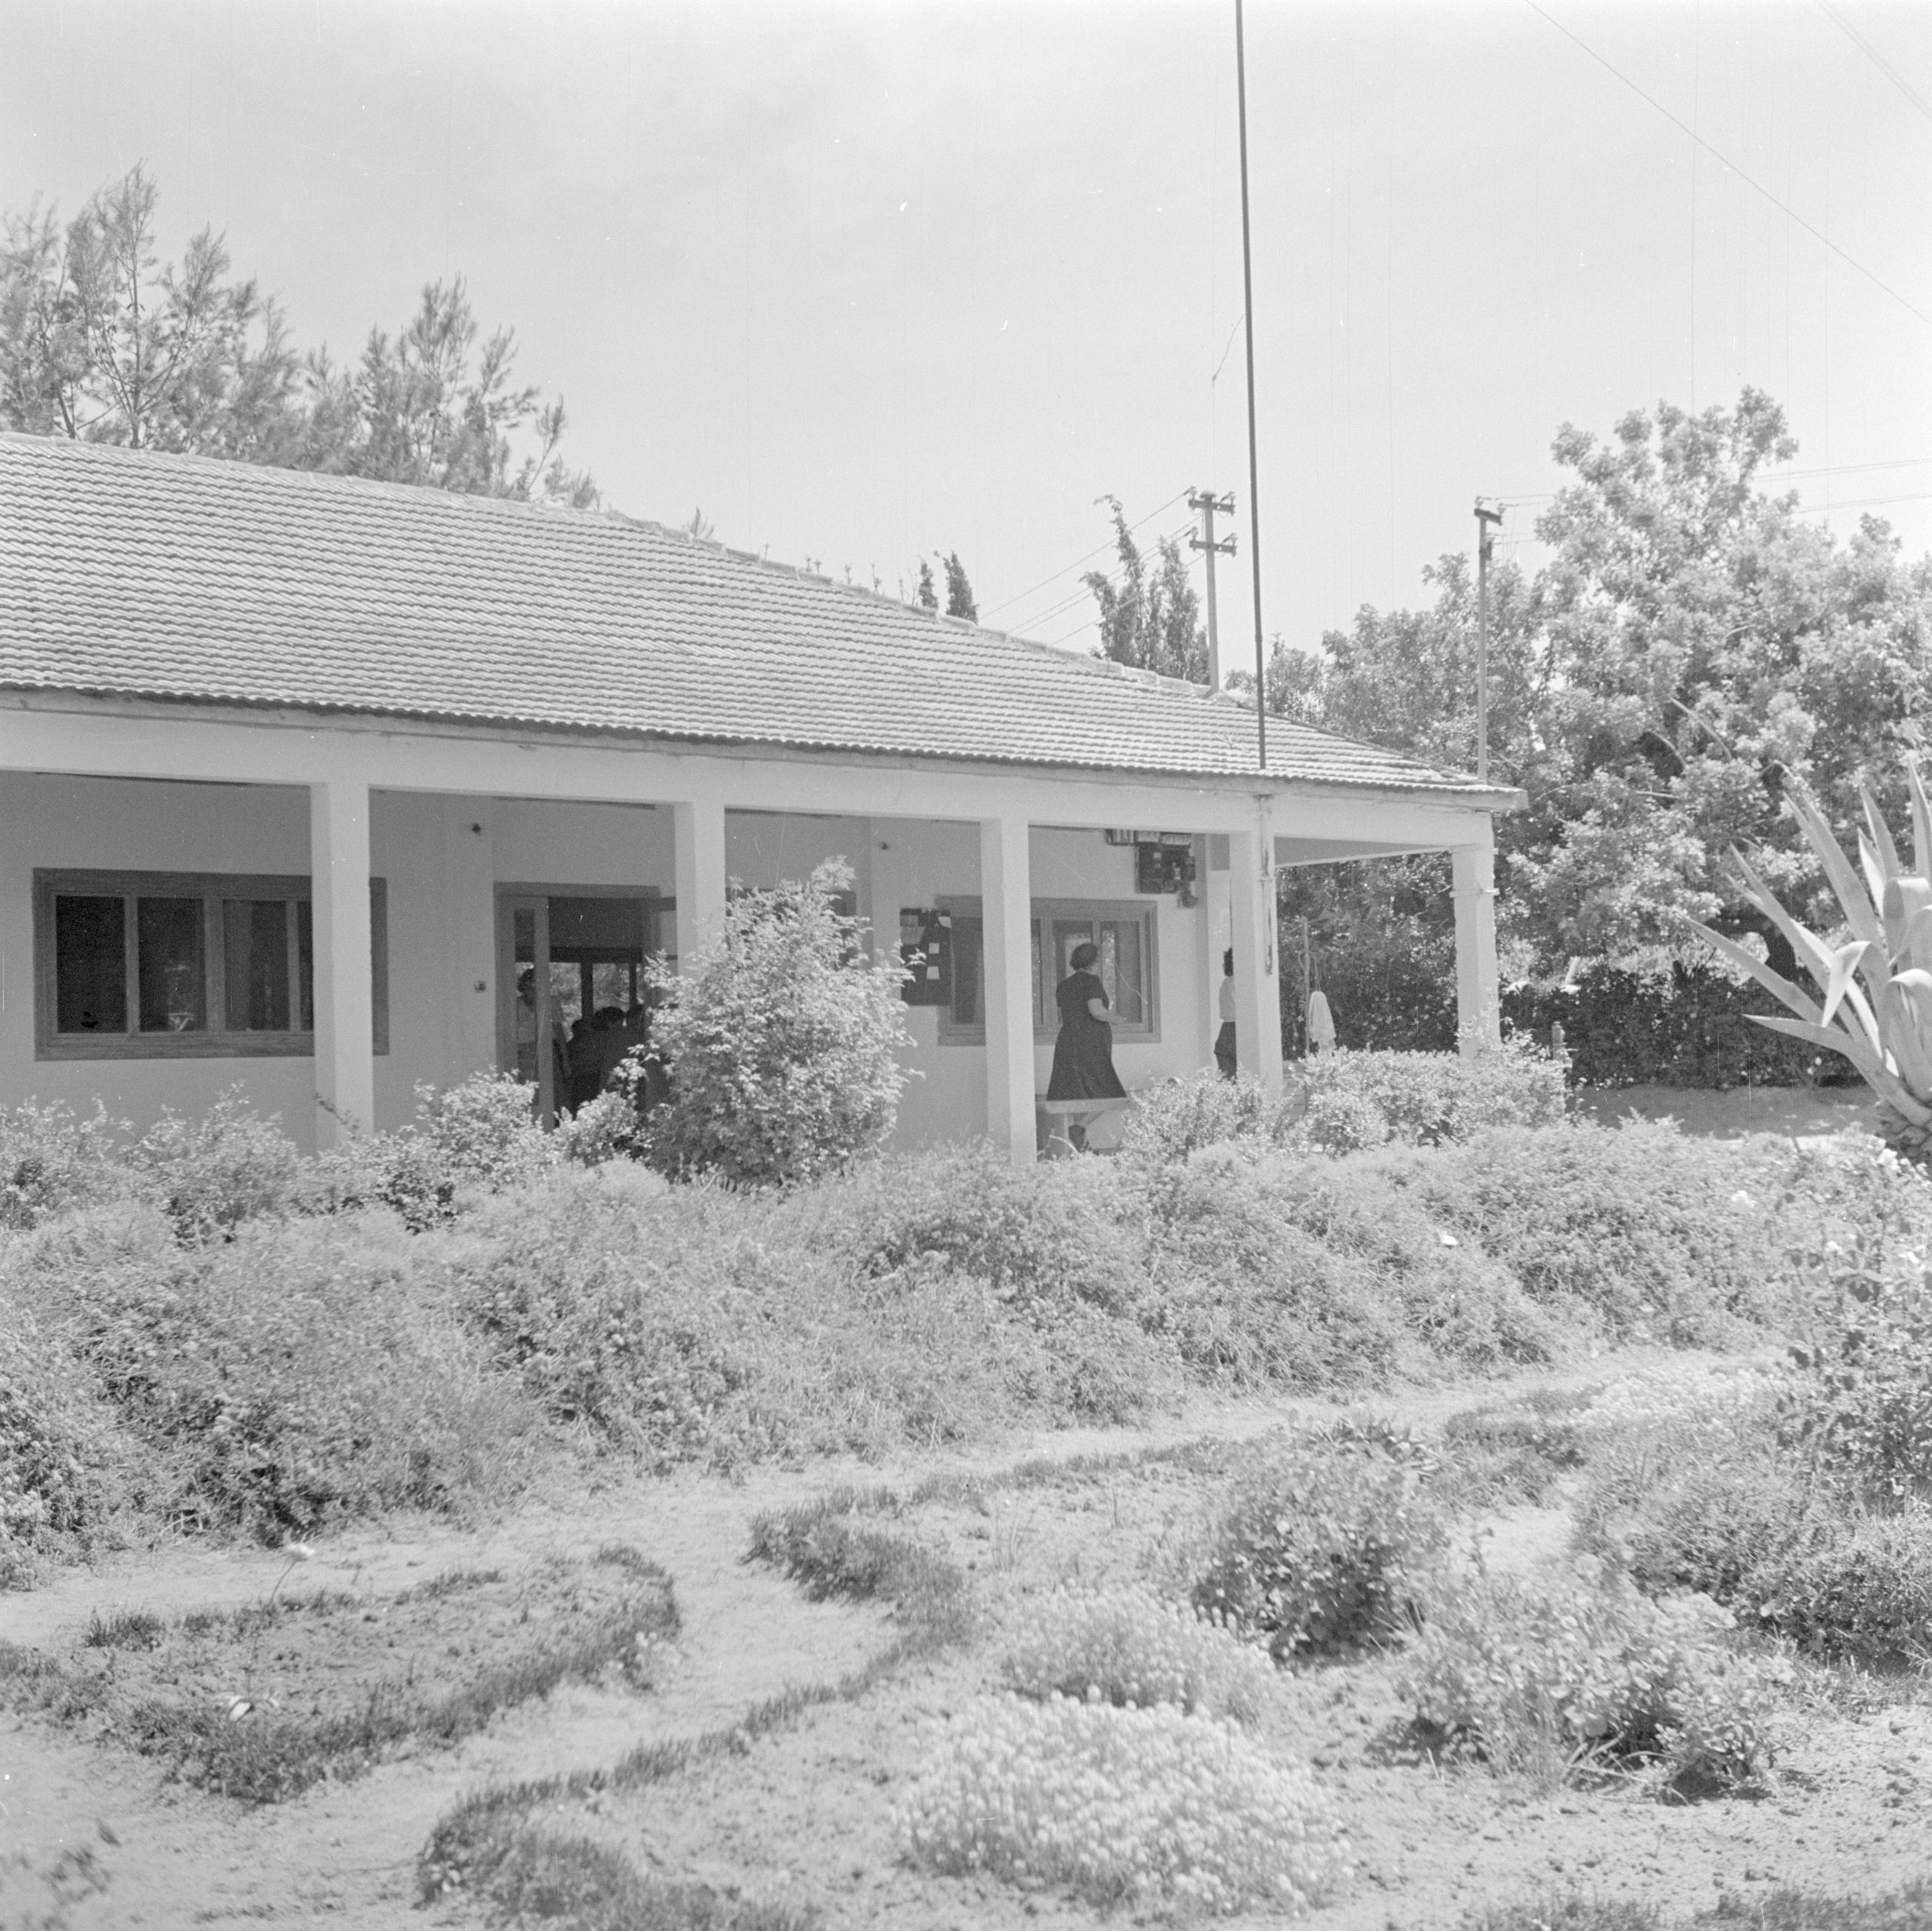 Filemoderne bungalows in kibboets ramat jochanan bestanddeelnr 255 0640 jpg